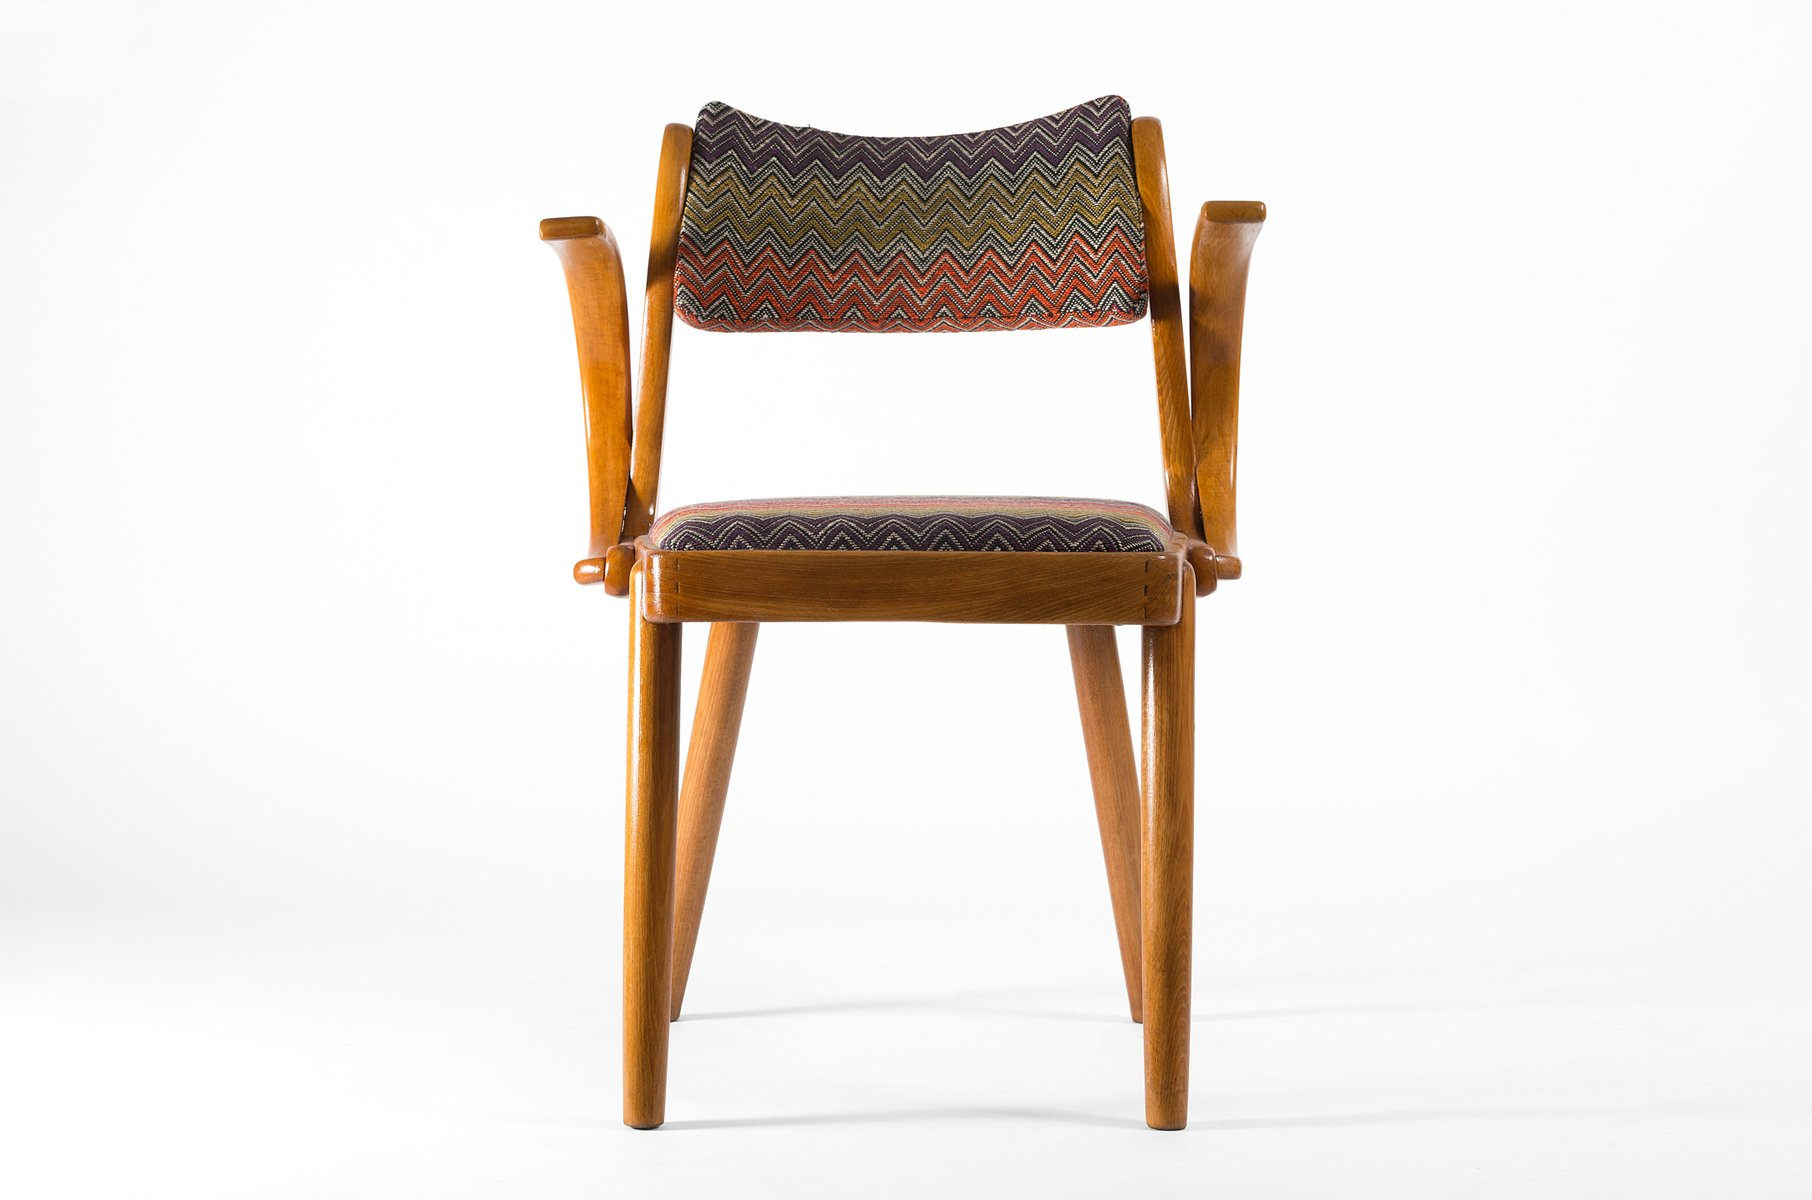 zickzack muster art deco armlehnstuhl 1930er bei pamono kaufen. Black Bedroom Furniture Sets. Home Design Ideas